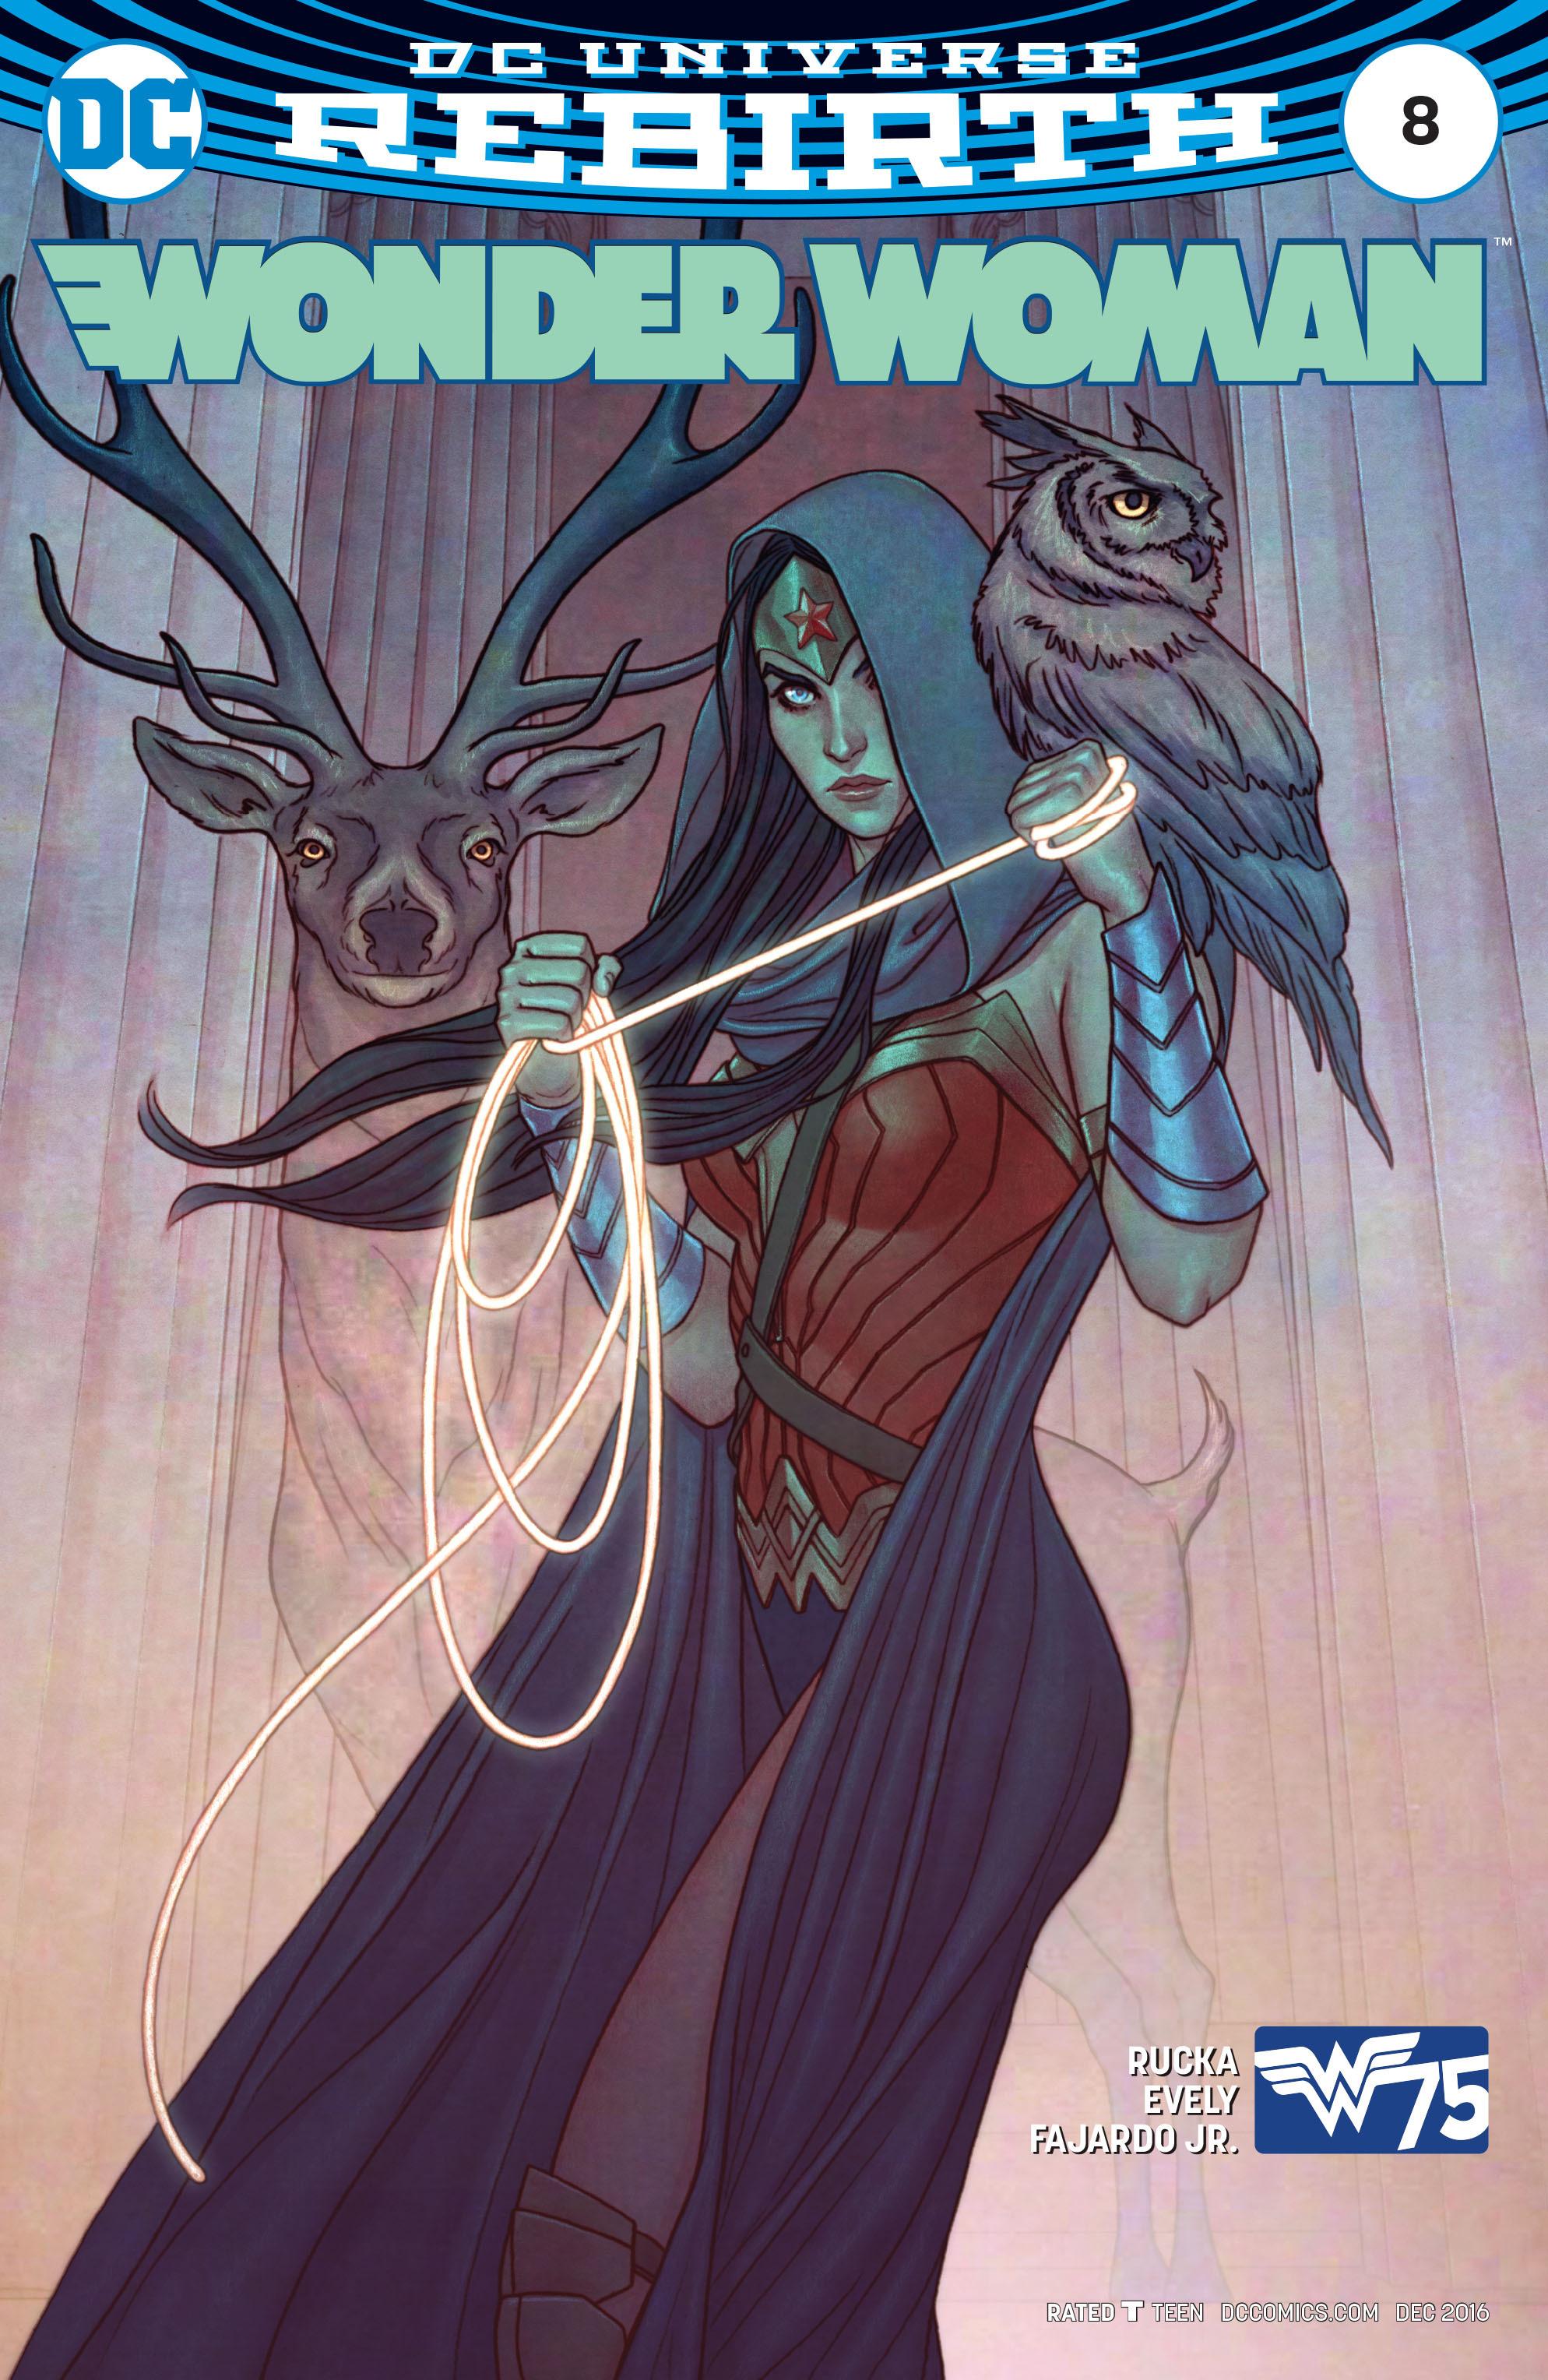 Read online Wonder Woman (2016) comic -  Issue #8 - 2